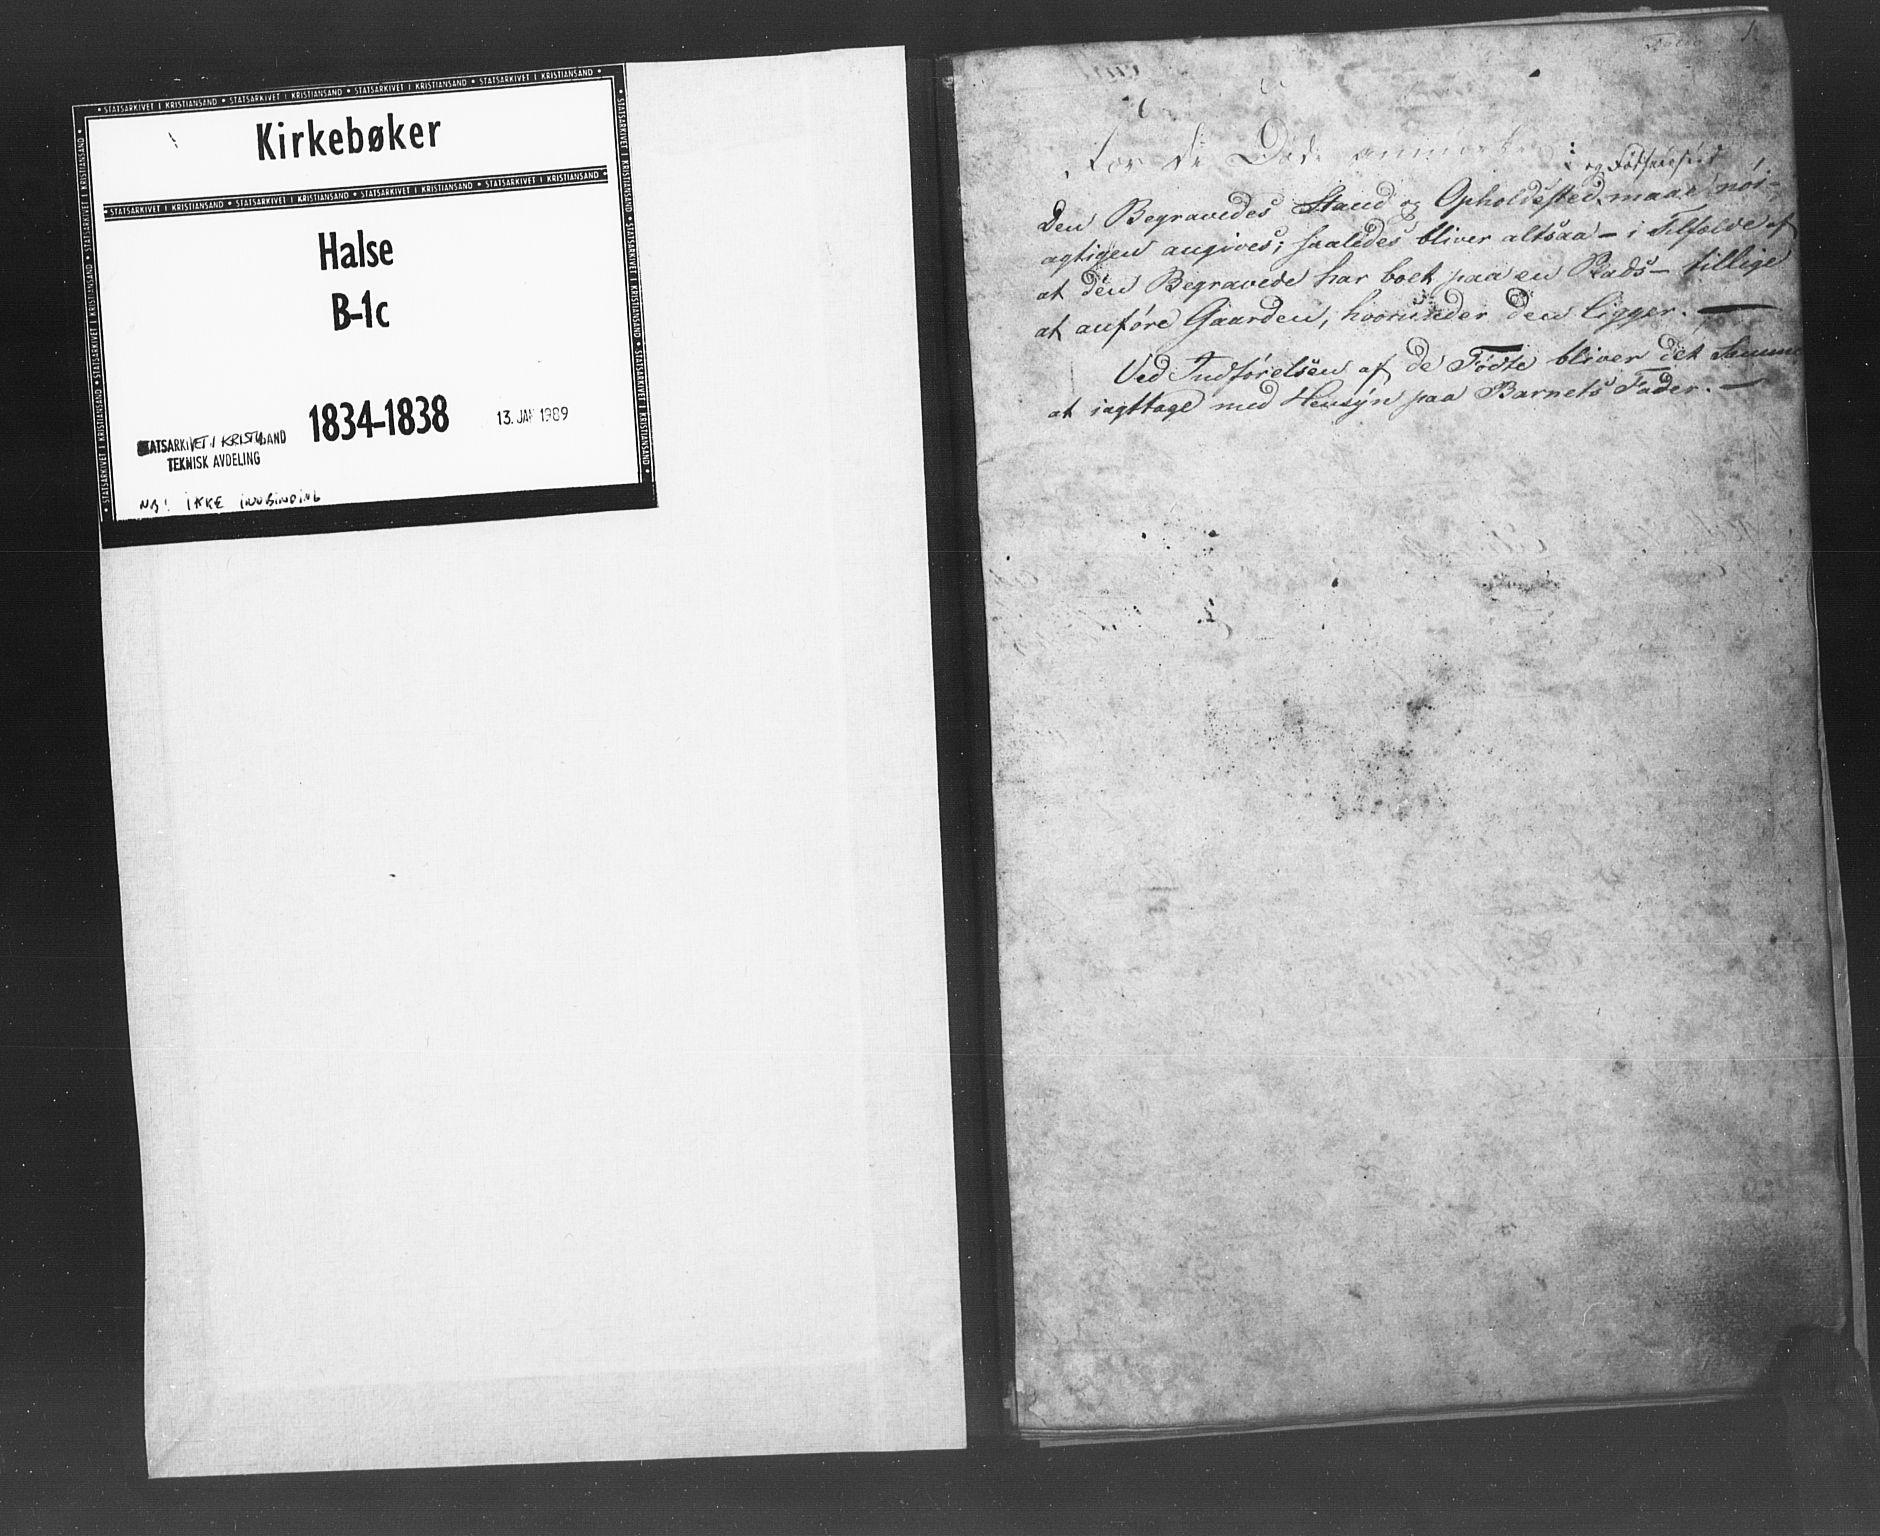 SAK, Mandal sokneprestkontor, F/Fb/Fba/L0003: Klokkerbok nr. B 1C, 1834-1838